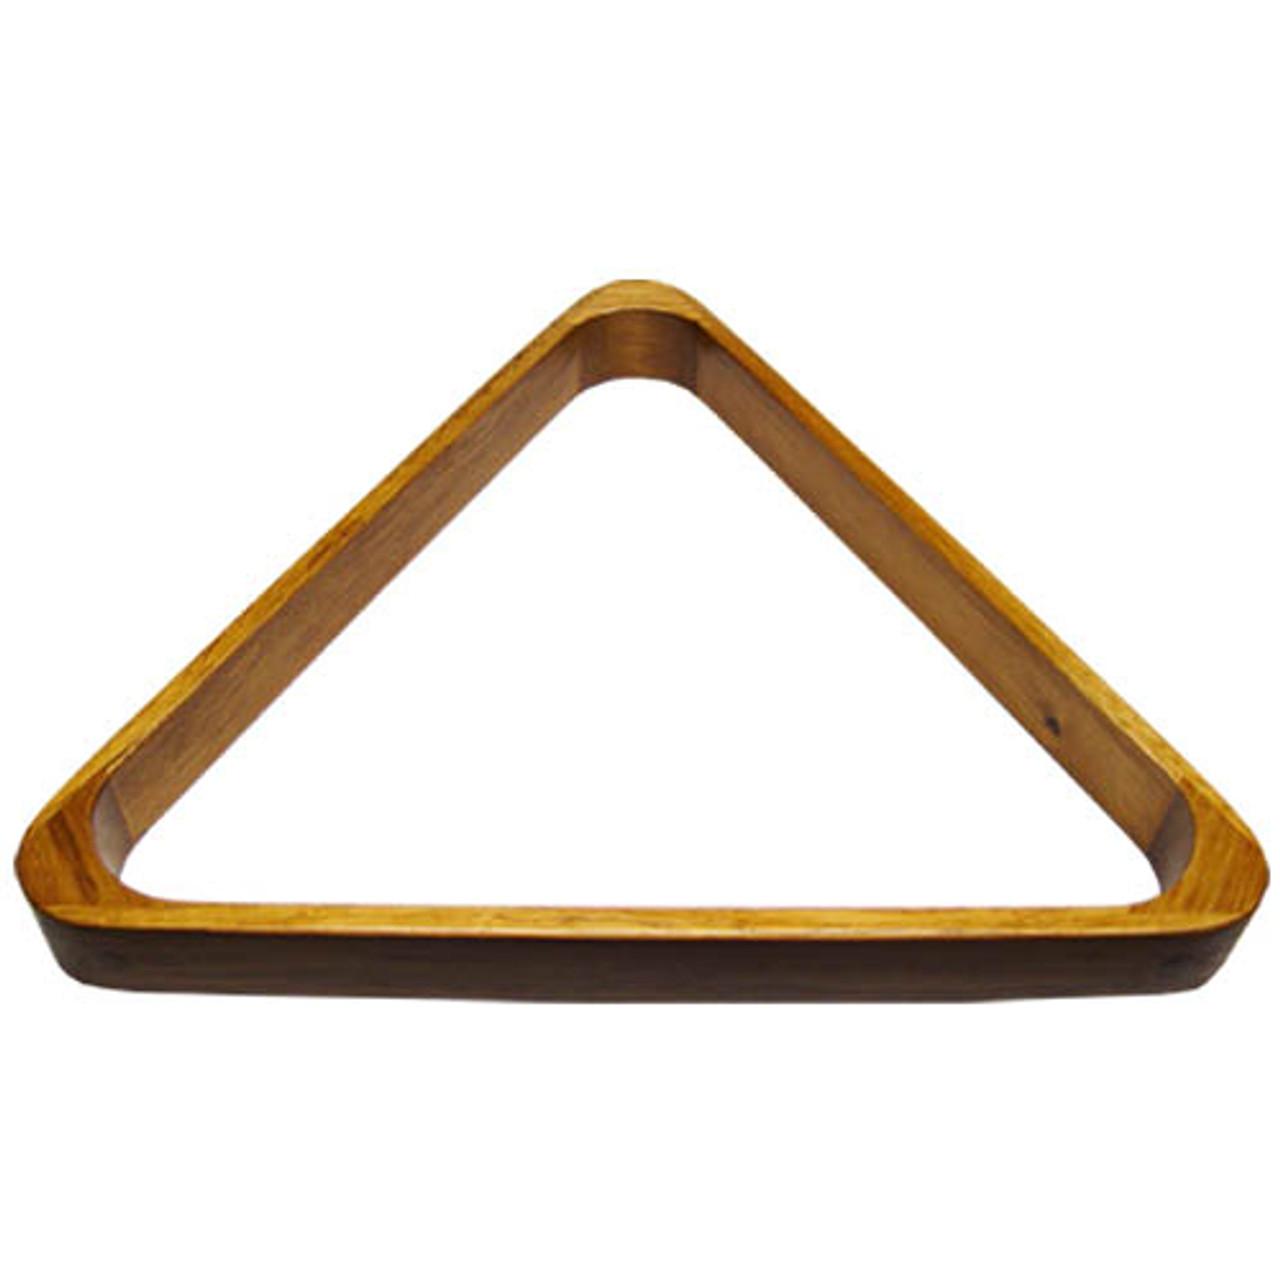 Deluxe Wood Pool Ball Triangle, Oak